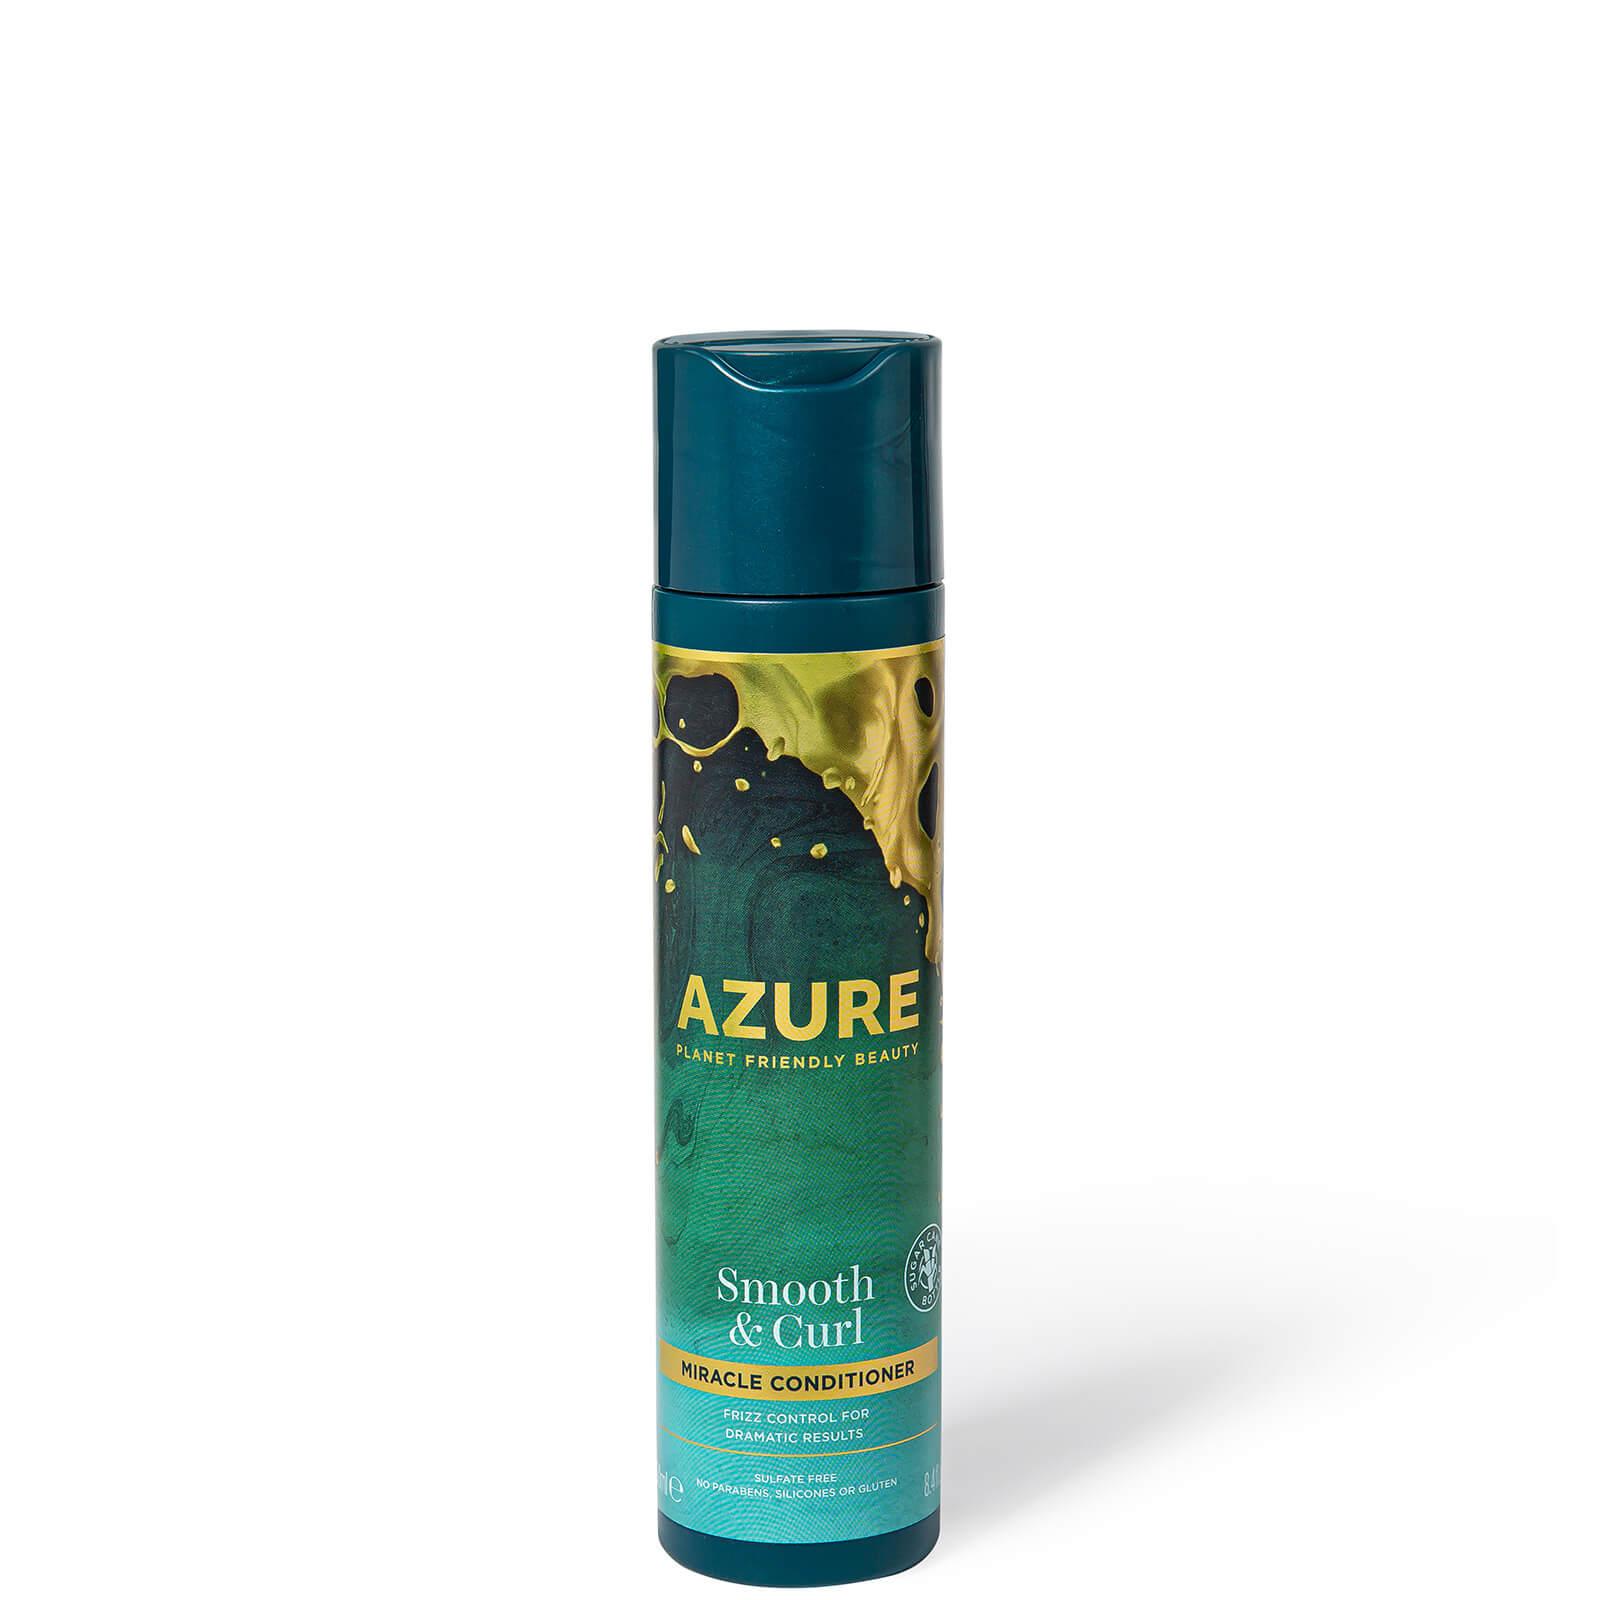 Купить Azure Smooth & Curl Miracle Conditioner 250ml